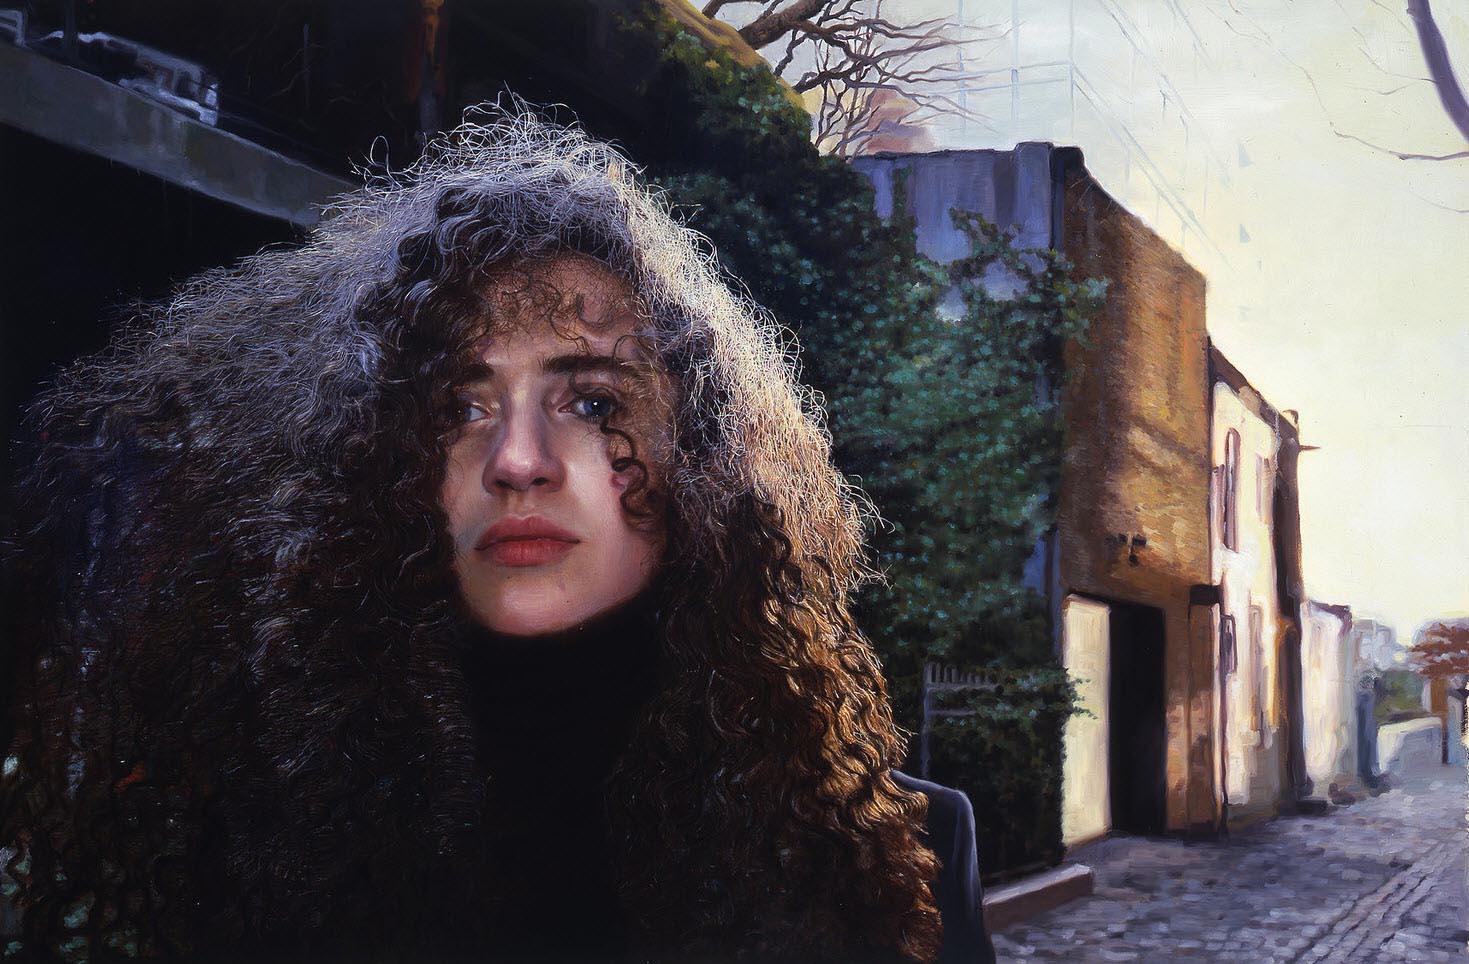 Игаль Озери (Yigal Ozeri), Sasha in the West Village